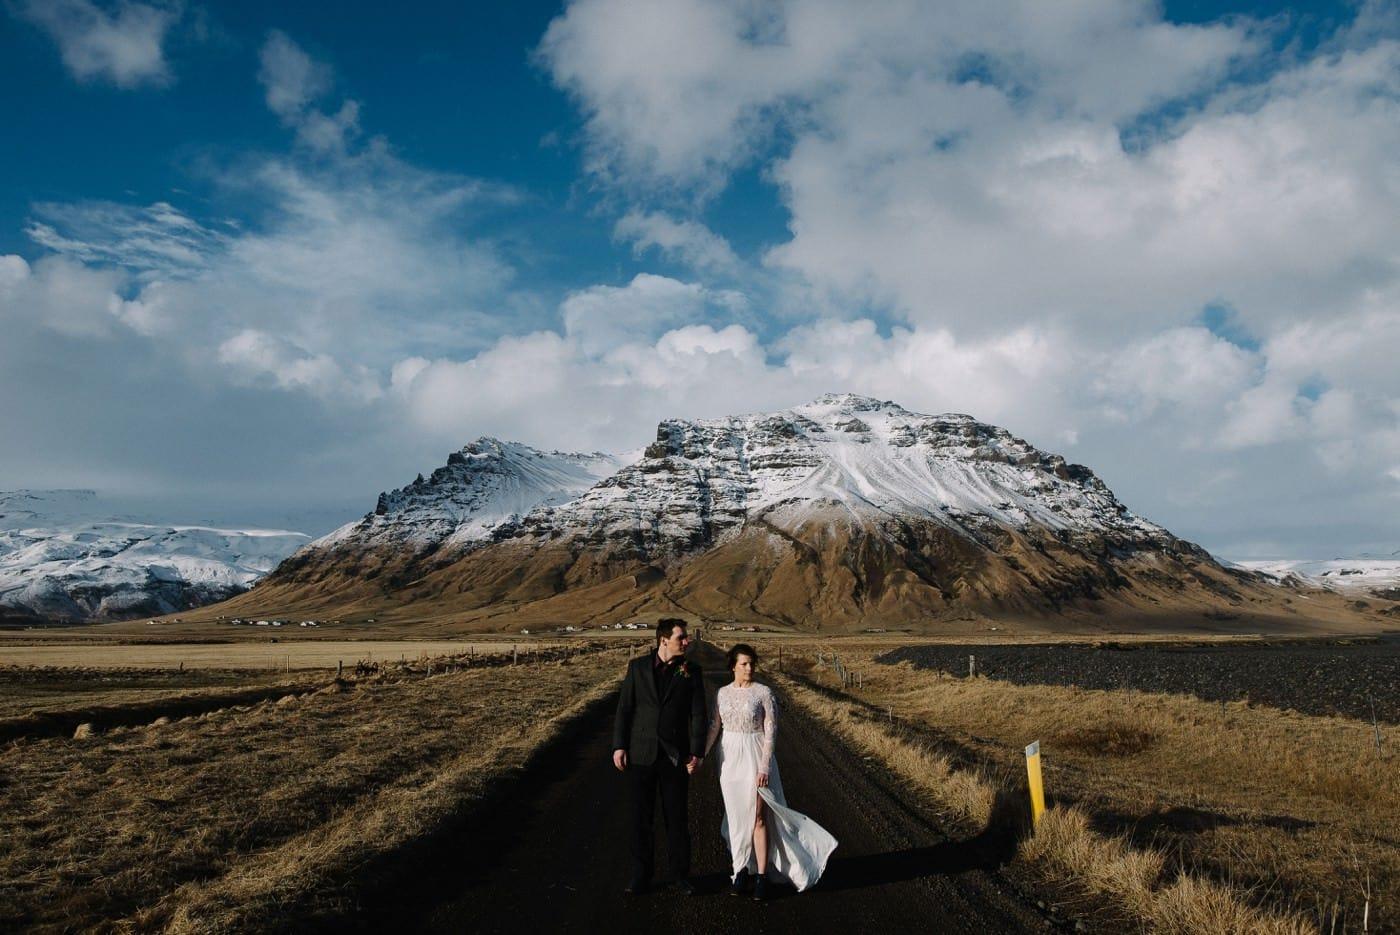 iceland-wedding-photographer-advenuture-elopement-iceland-photography_0067